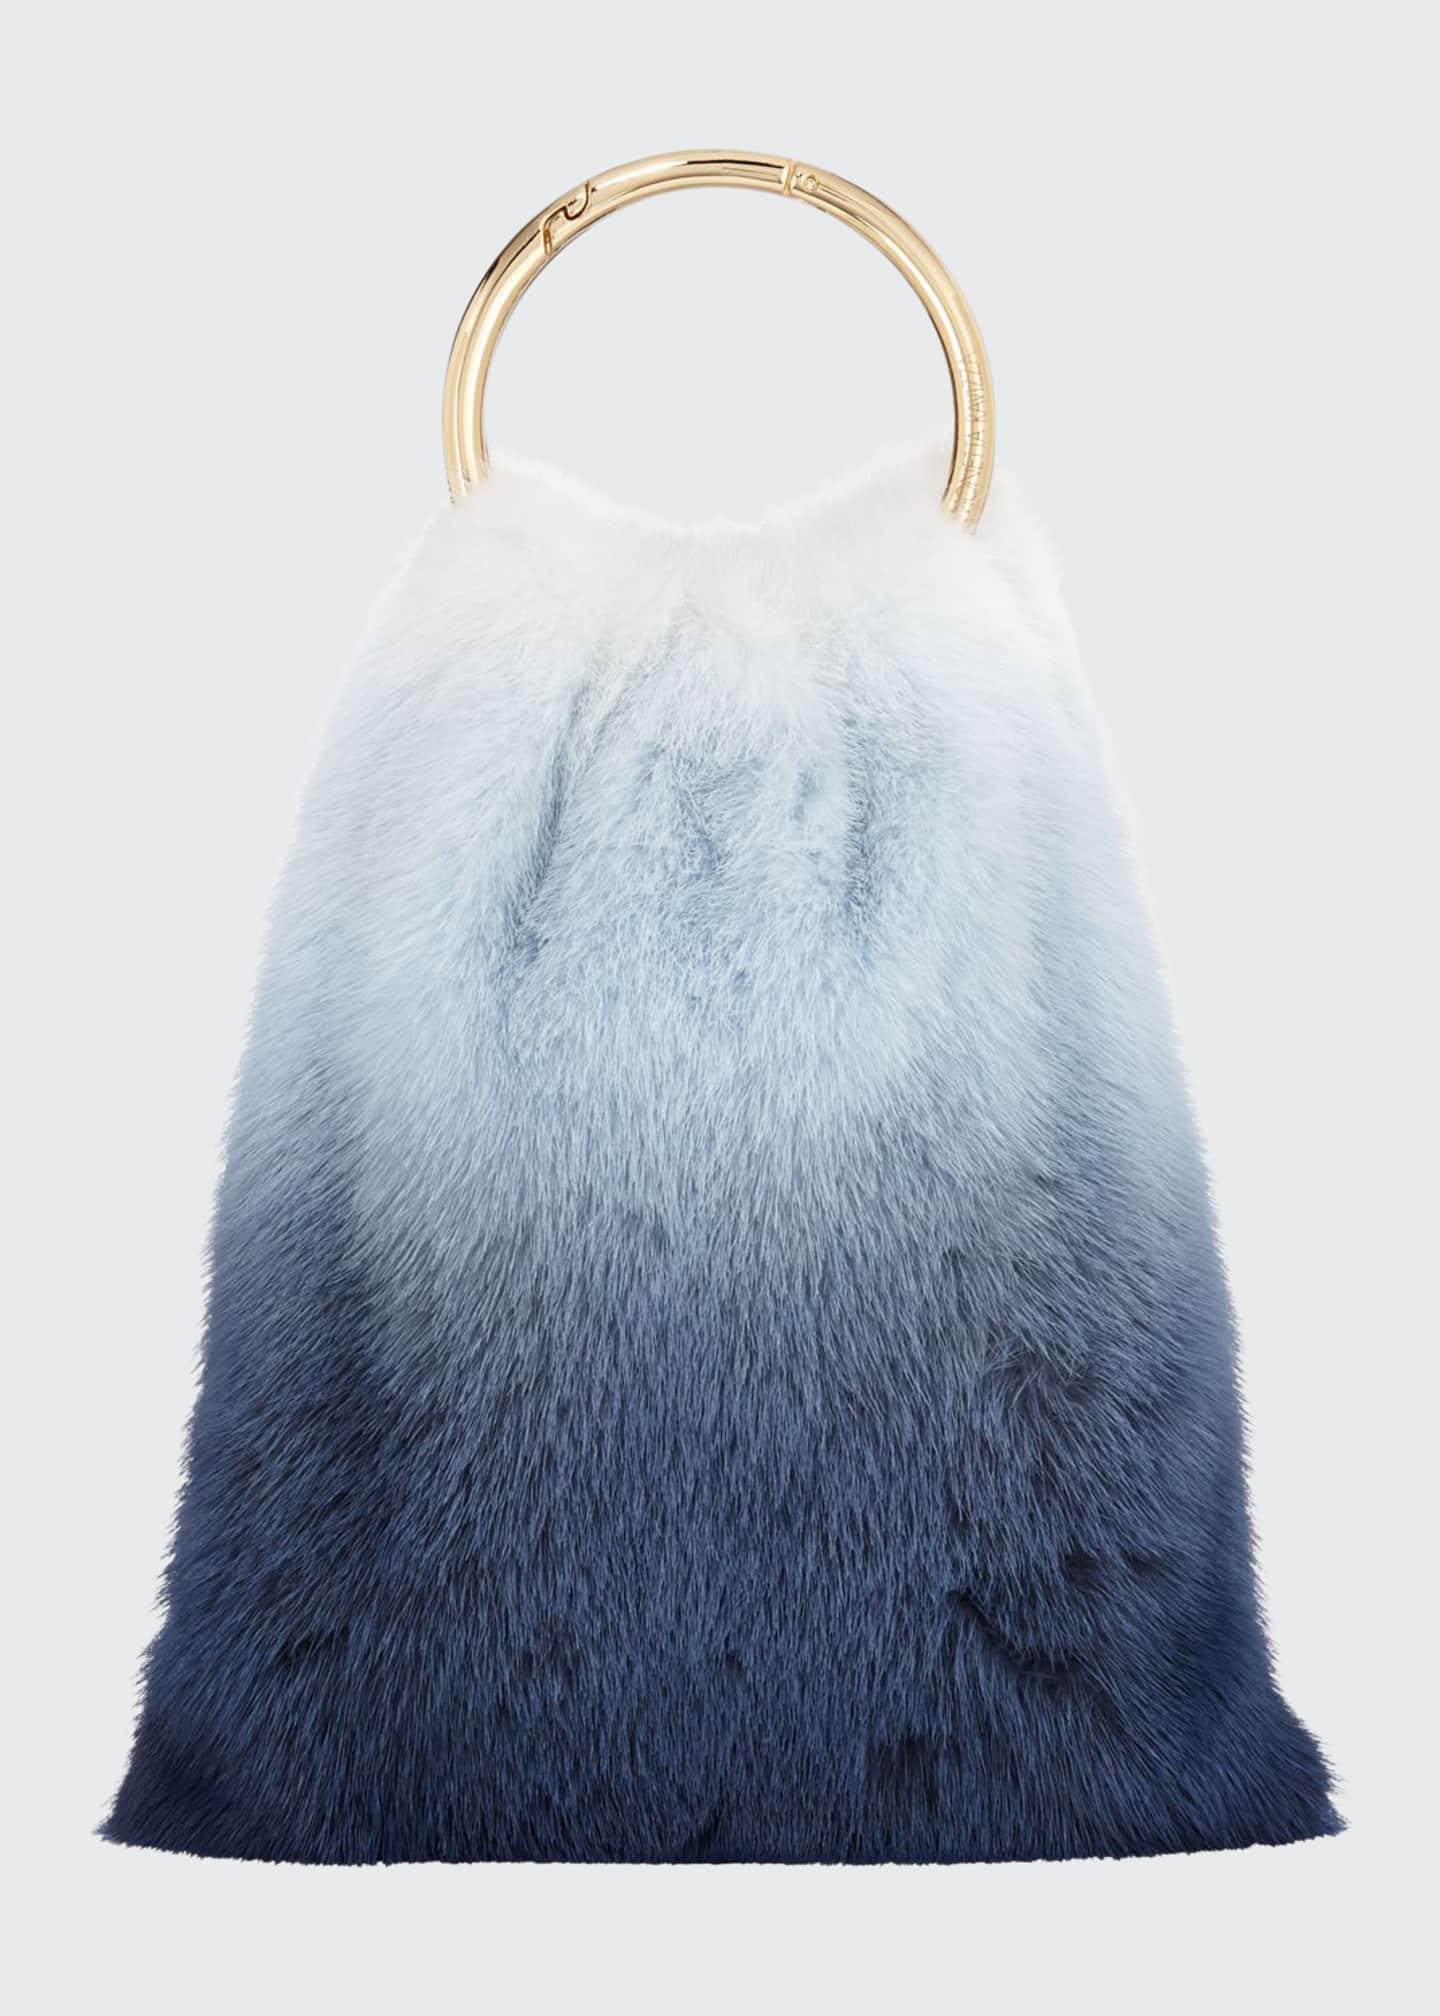 Simonetta Ravizza Furrissima Ombré Mink Top Handle Bag,